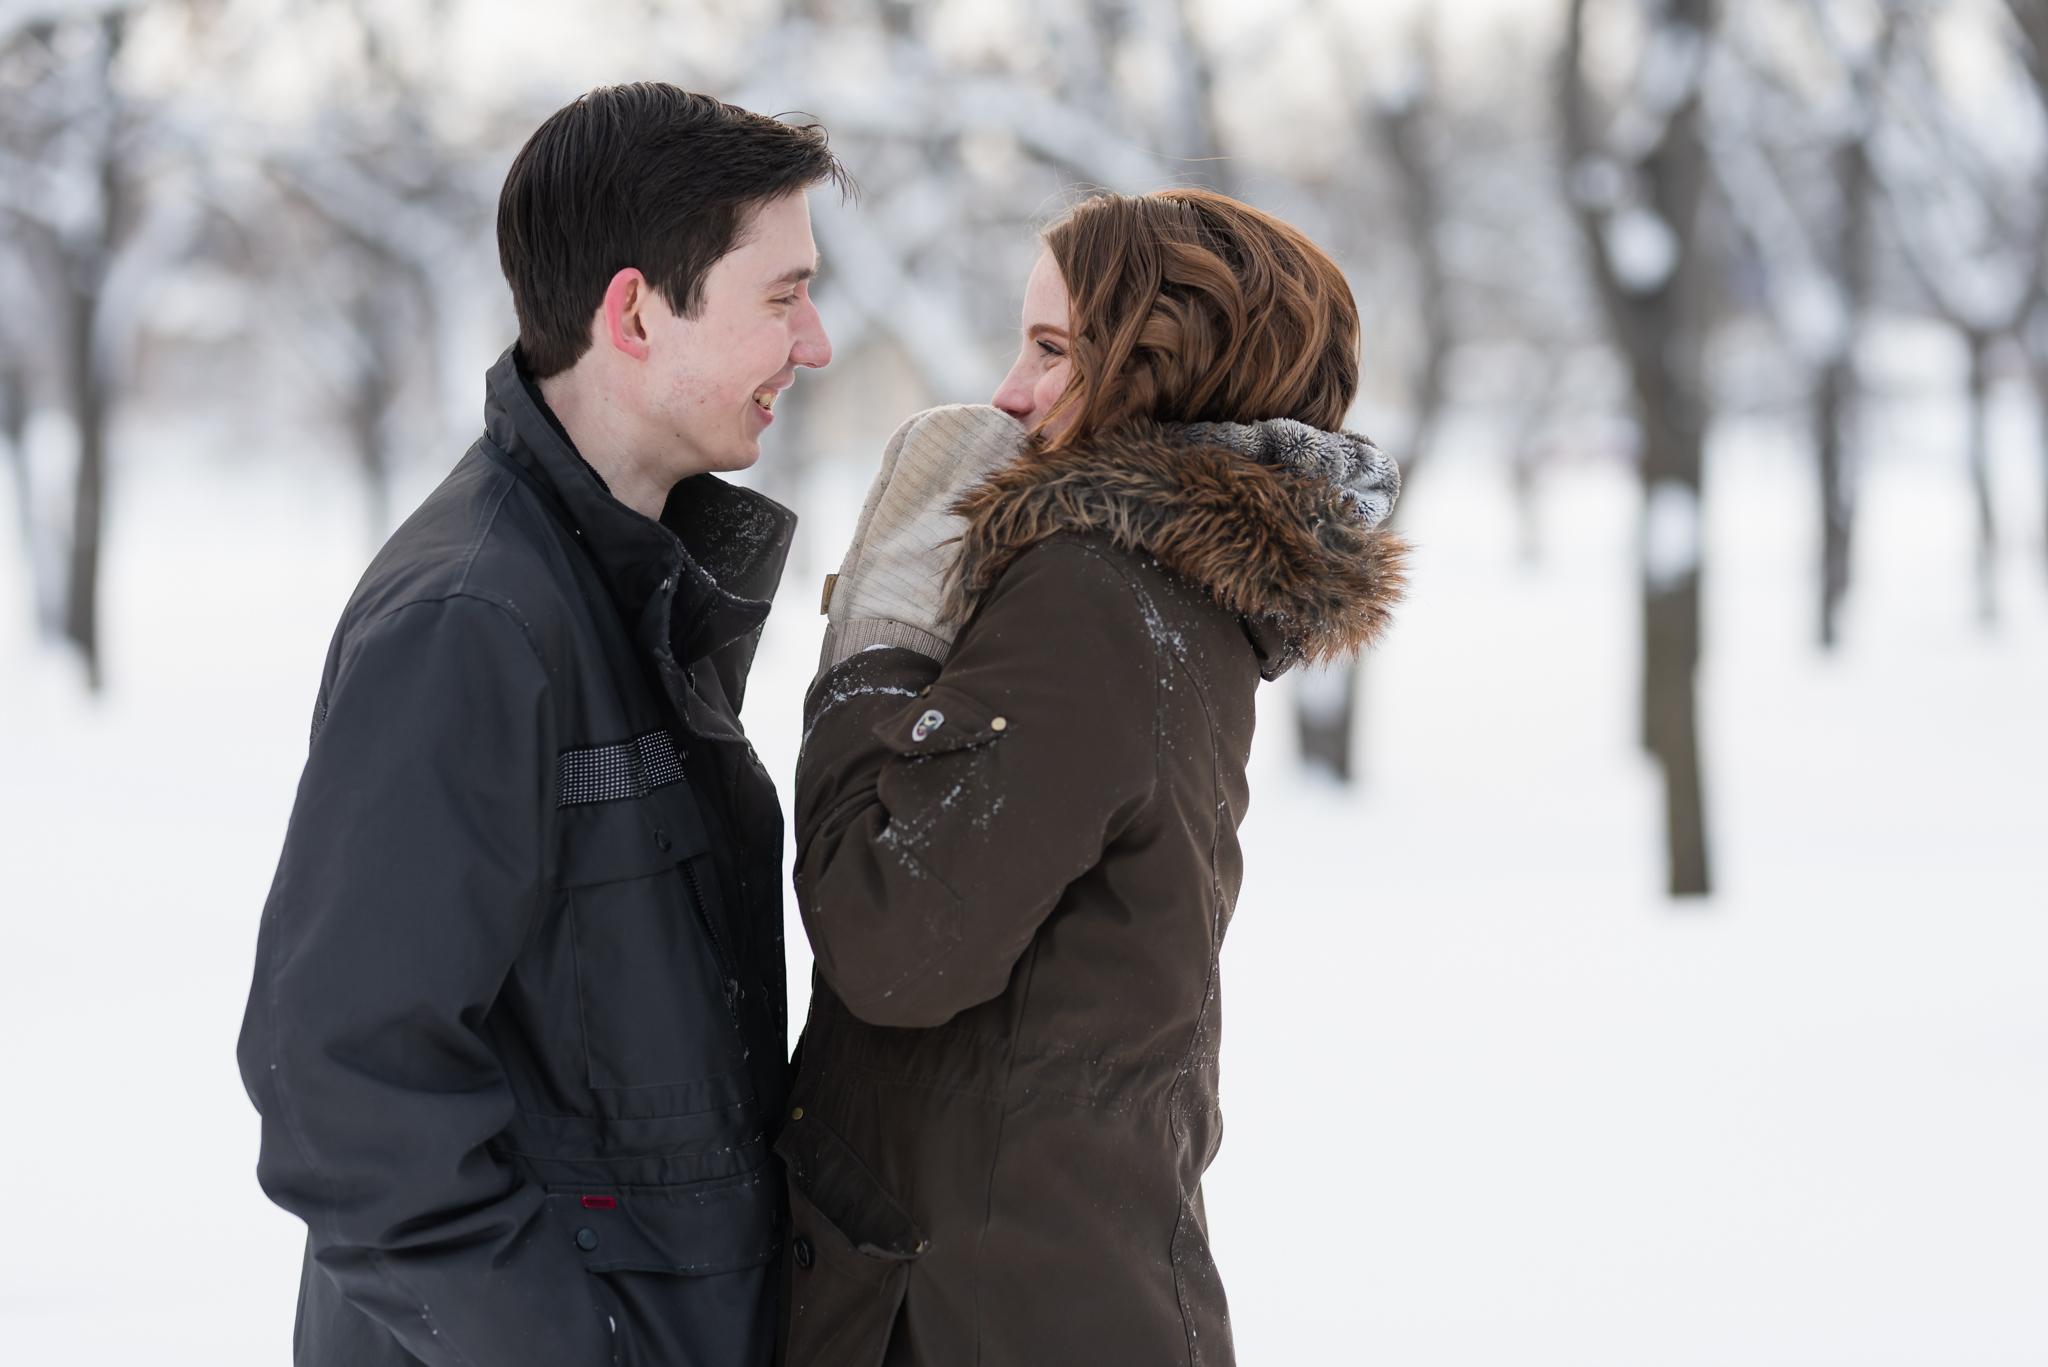 Fargo ND Winter Engagement Photos | Fargo Wedding Photographer